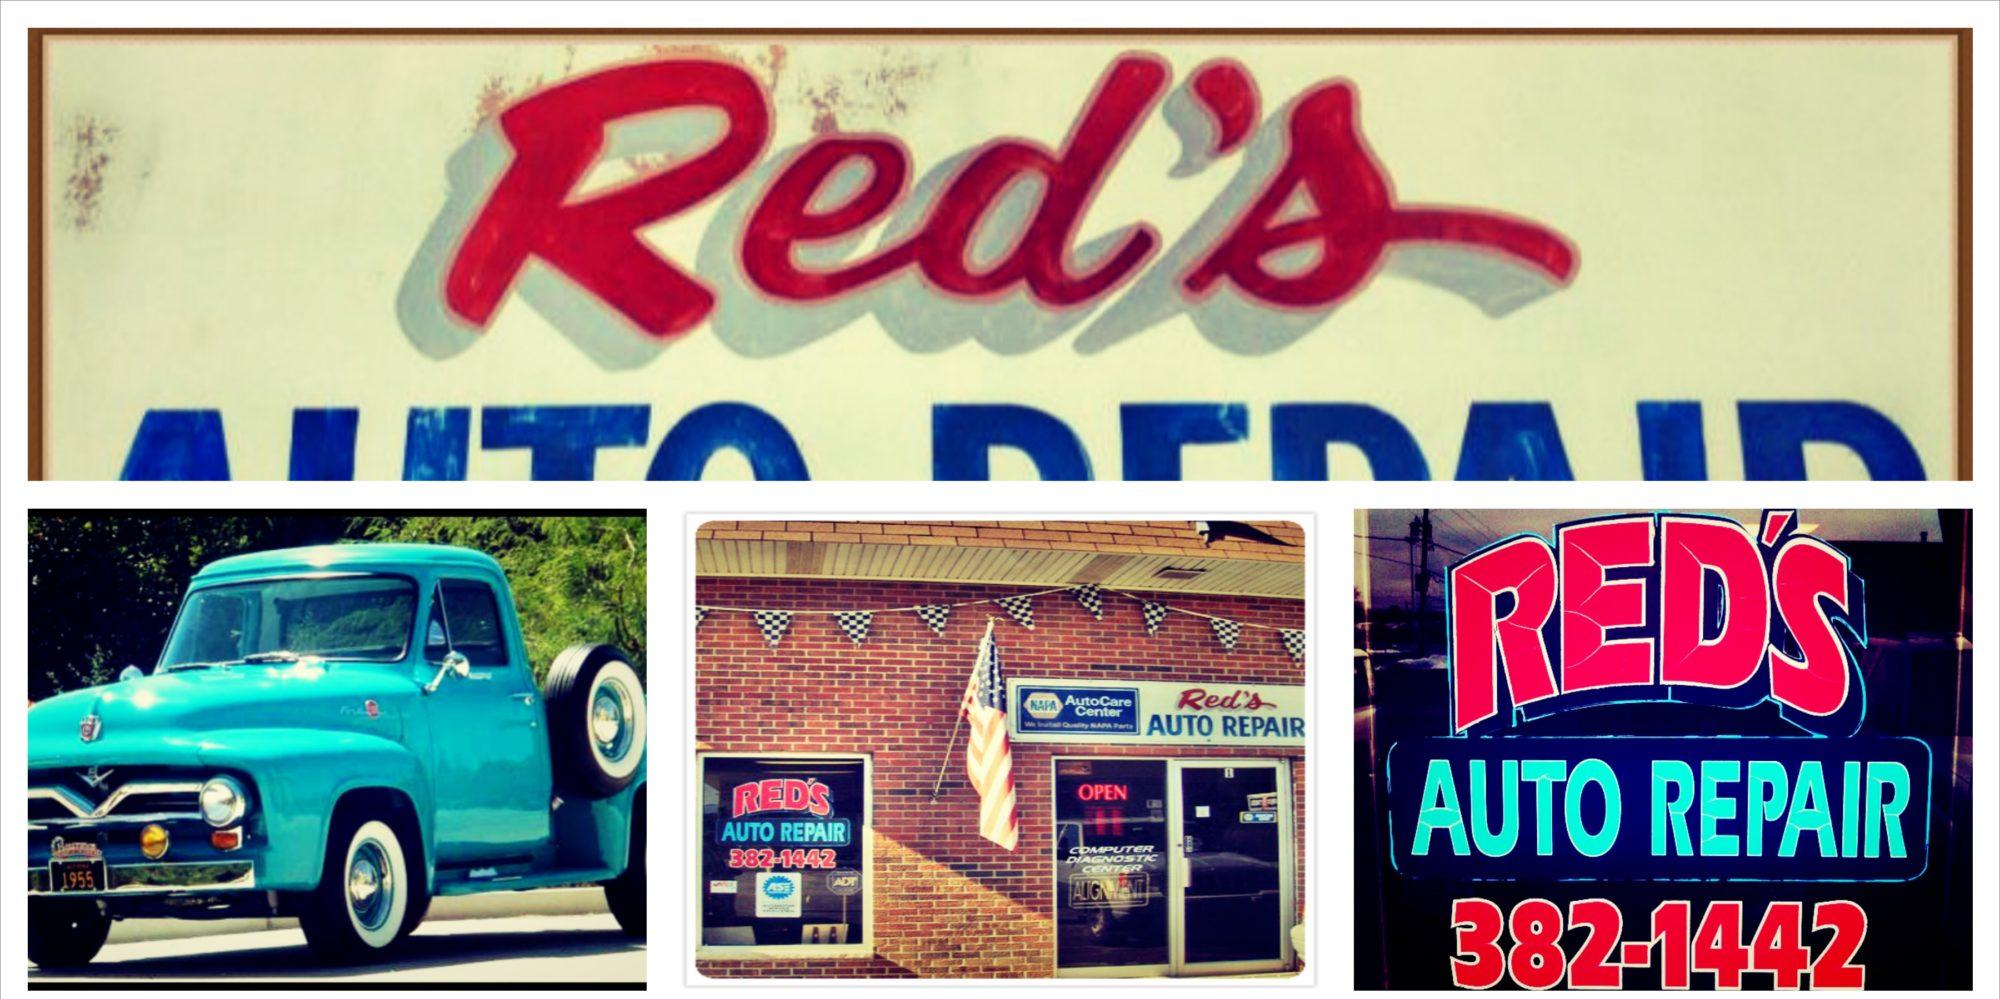 Reds Auto & Fleet Service